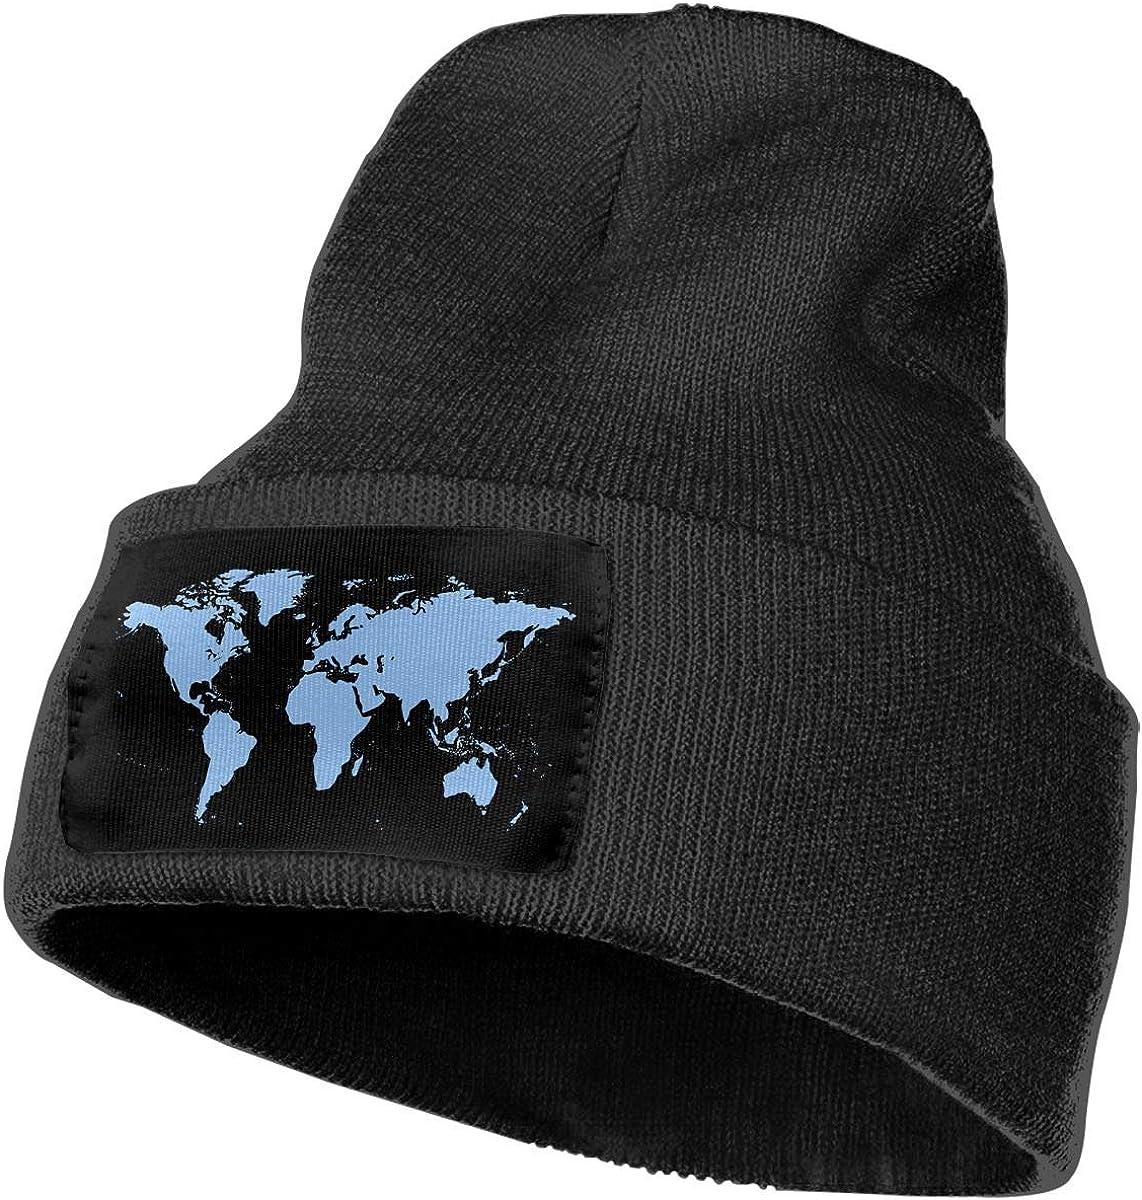 COLLJL-8 Men /& Women Clipart World Map Outdoor Stretch Knit Beanies Hat Soft Winter Knit Caps